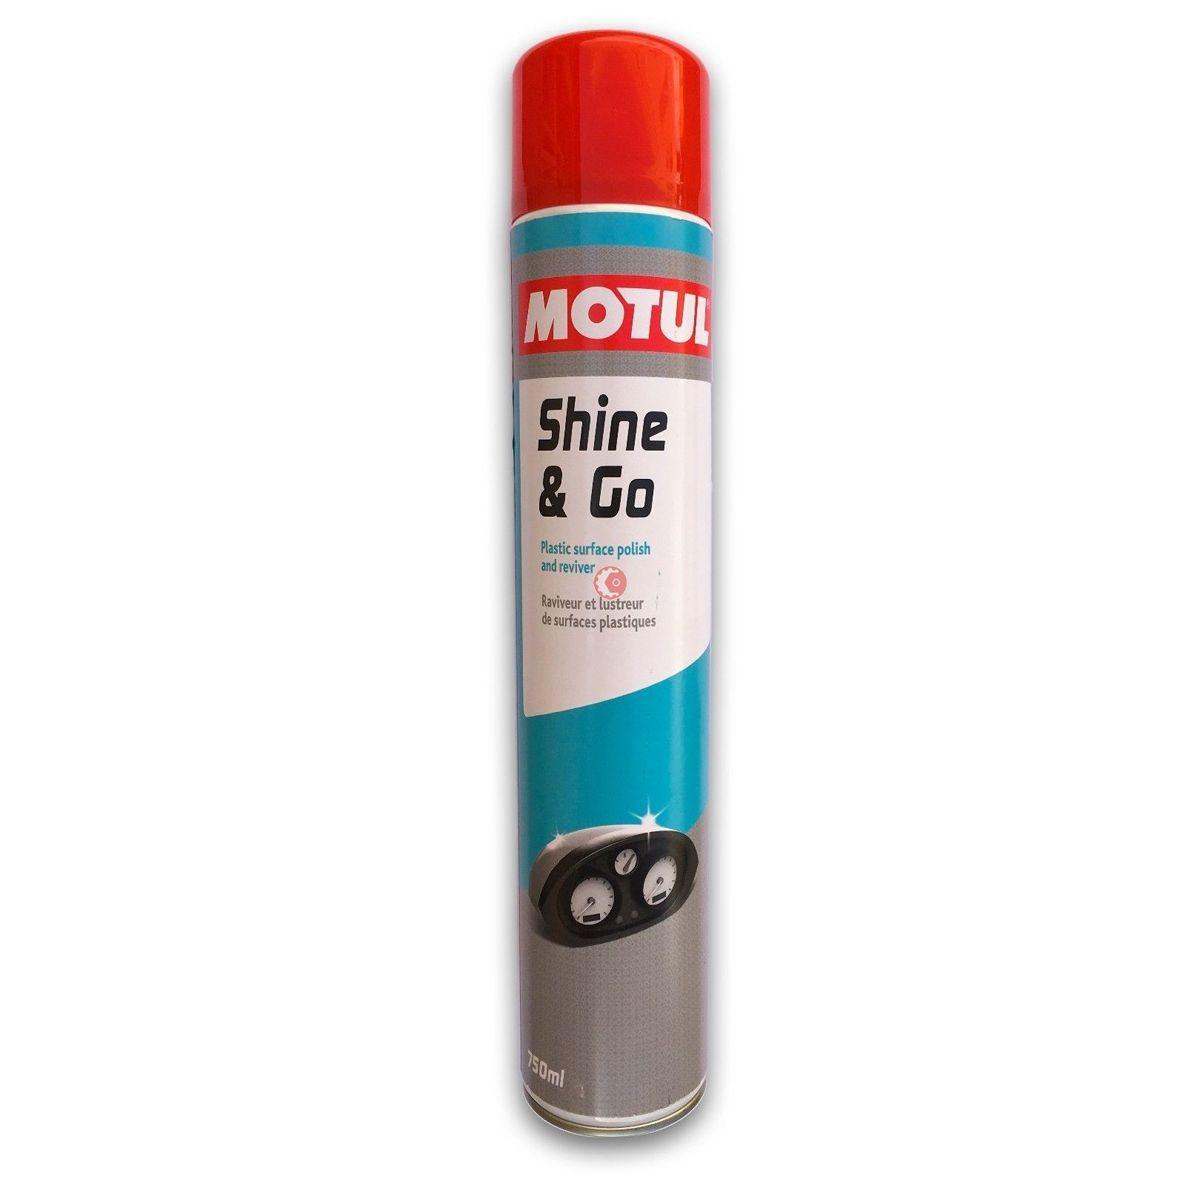 Motul Shine & Go Spray Brilho Regenerador Plastico 750ml